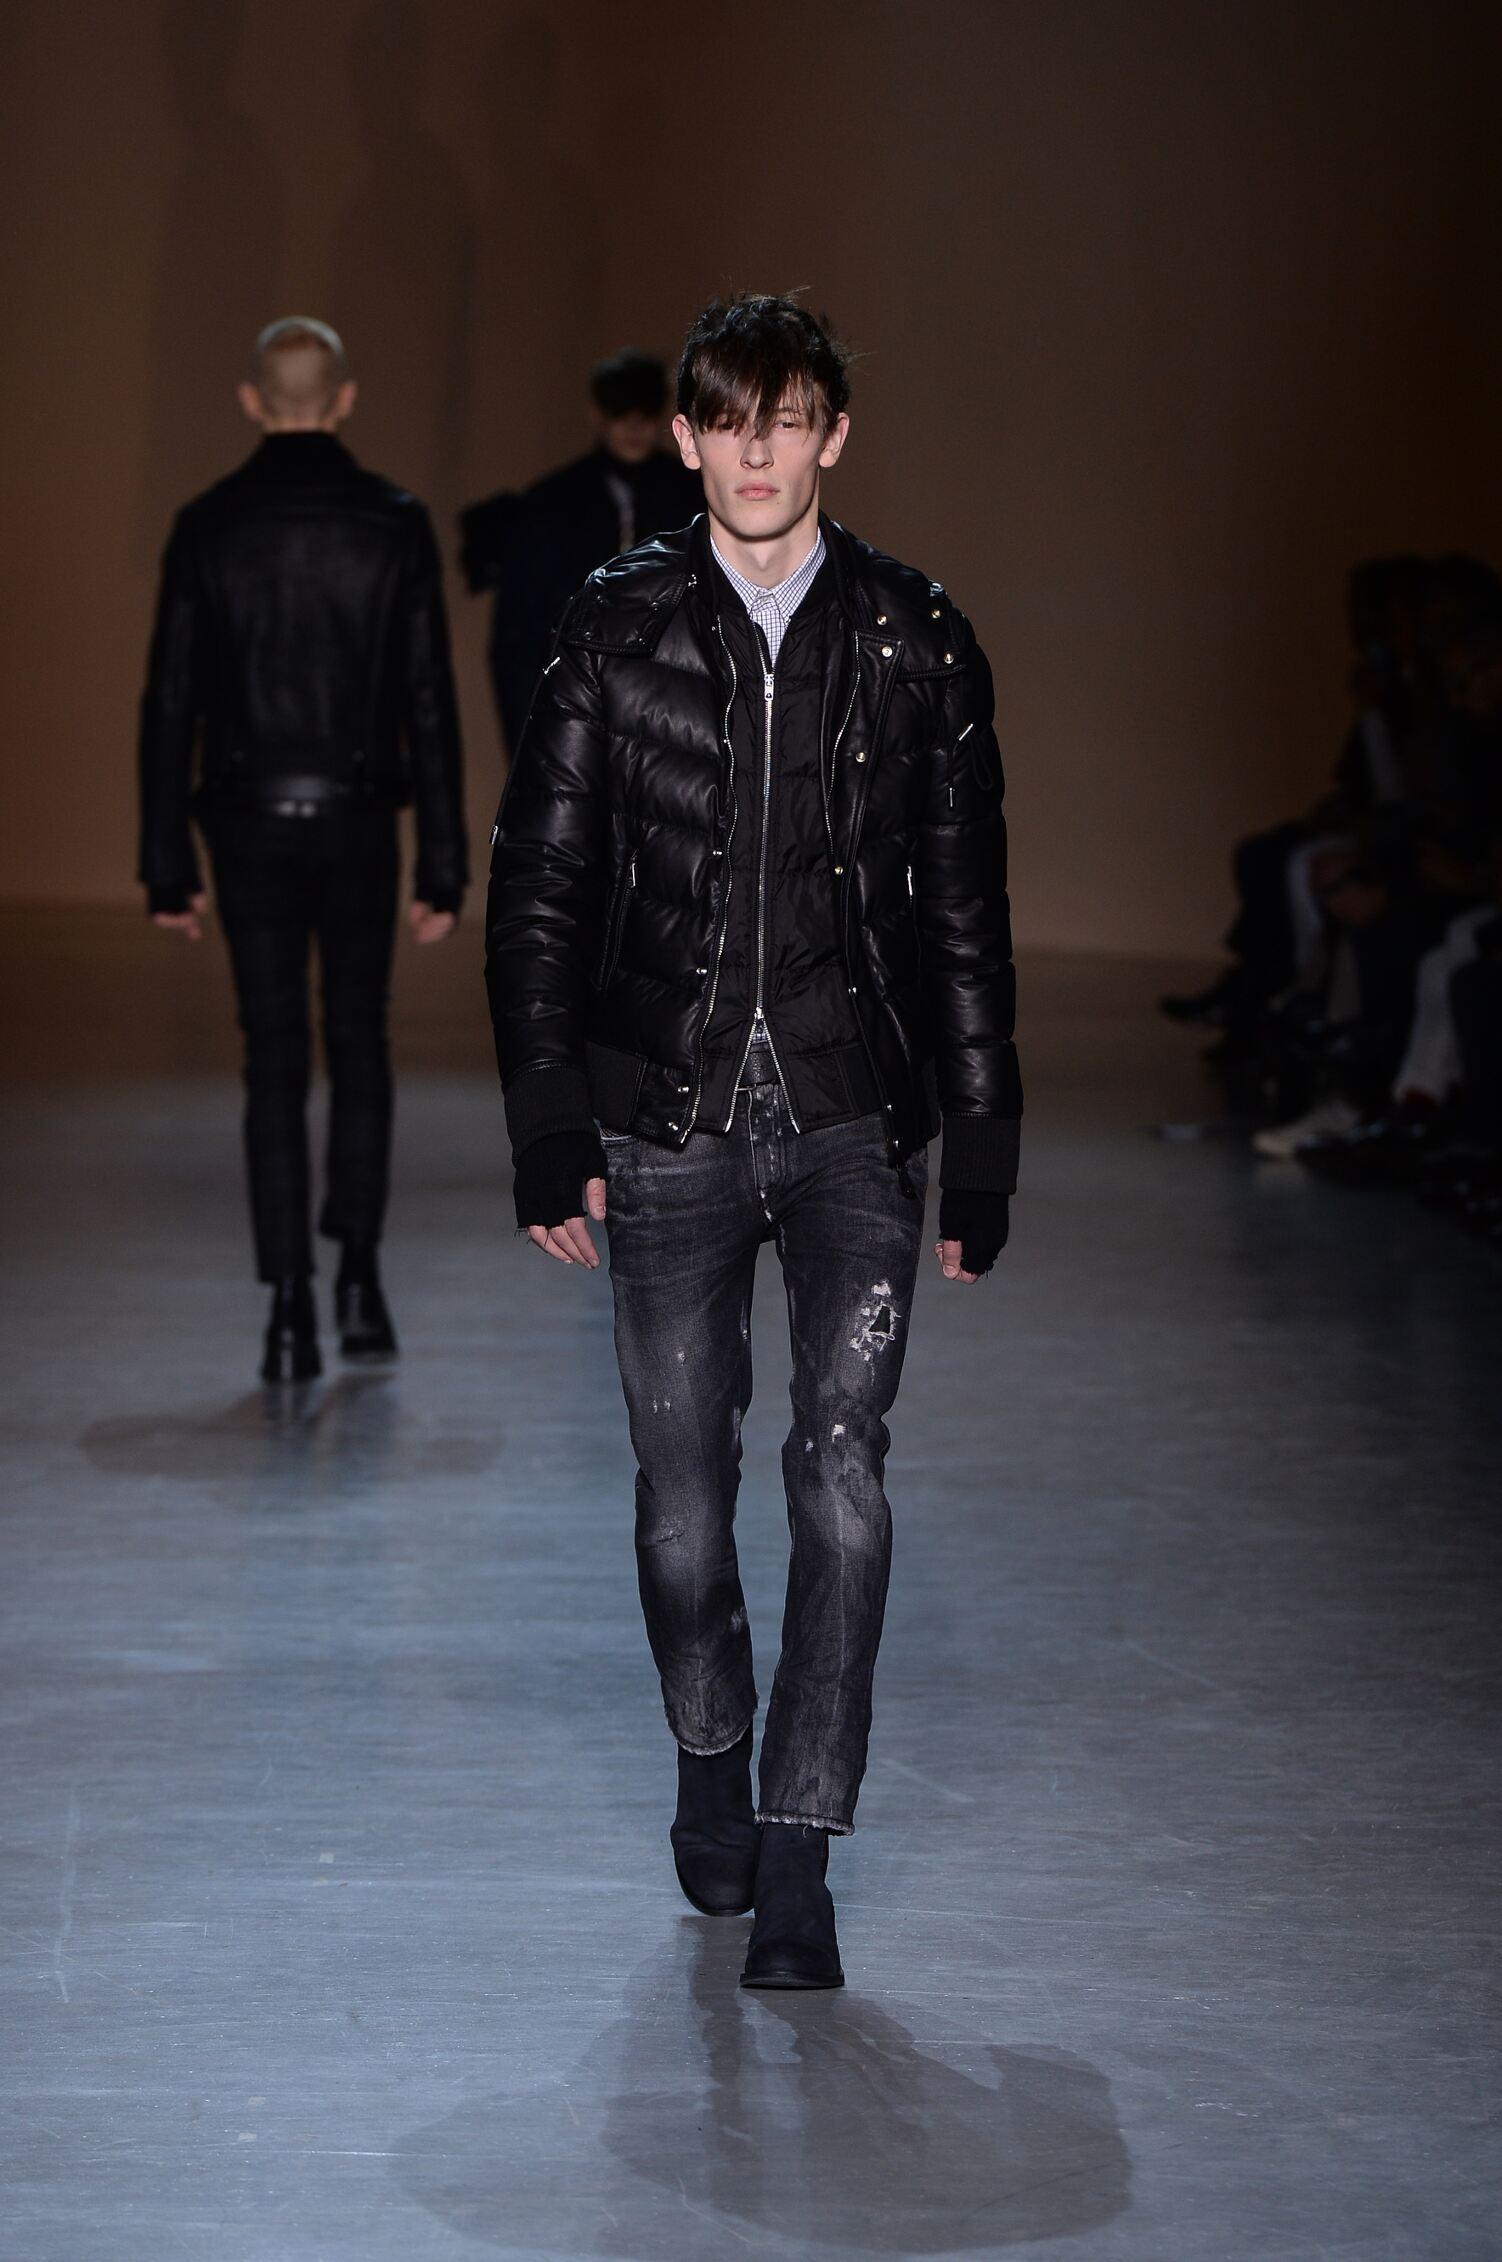 Diesel Black Gold Milano Fashion Week Menswear